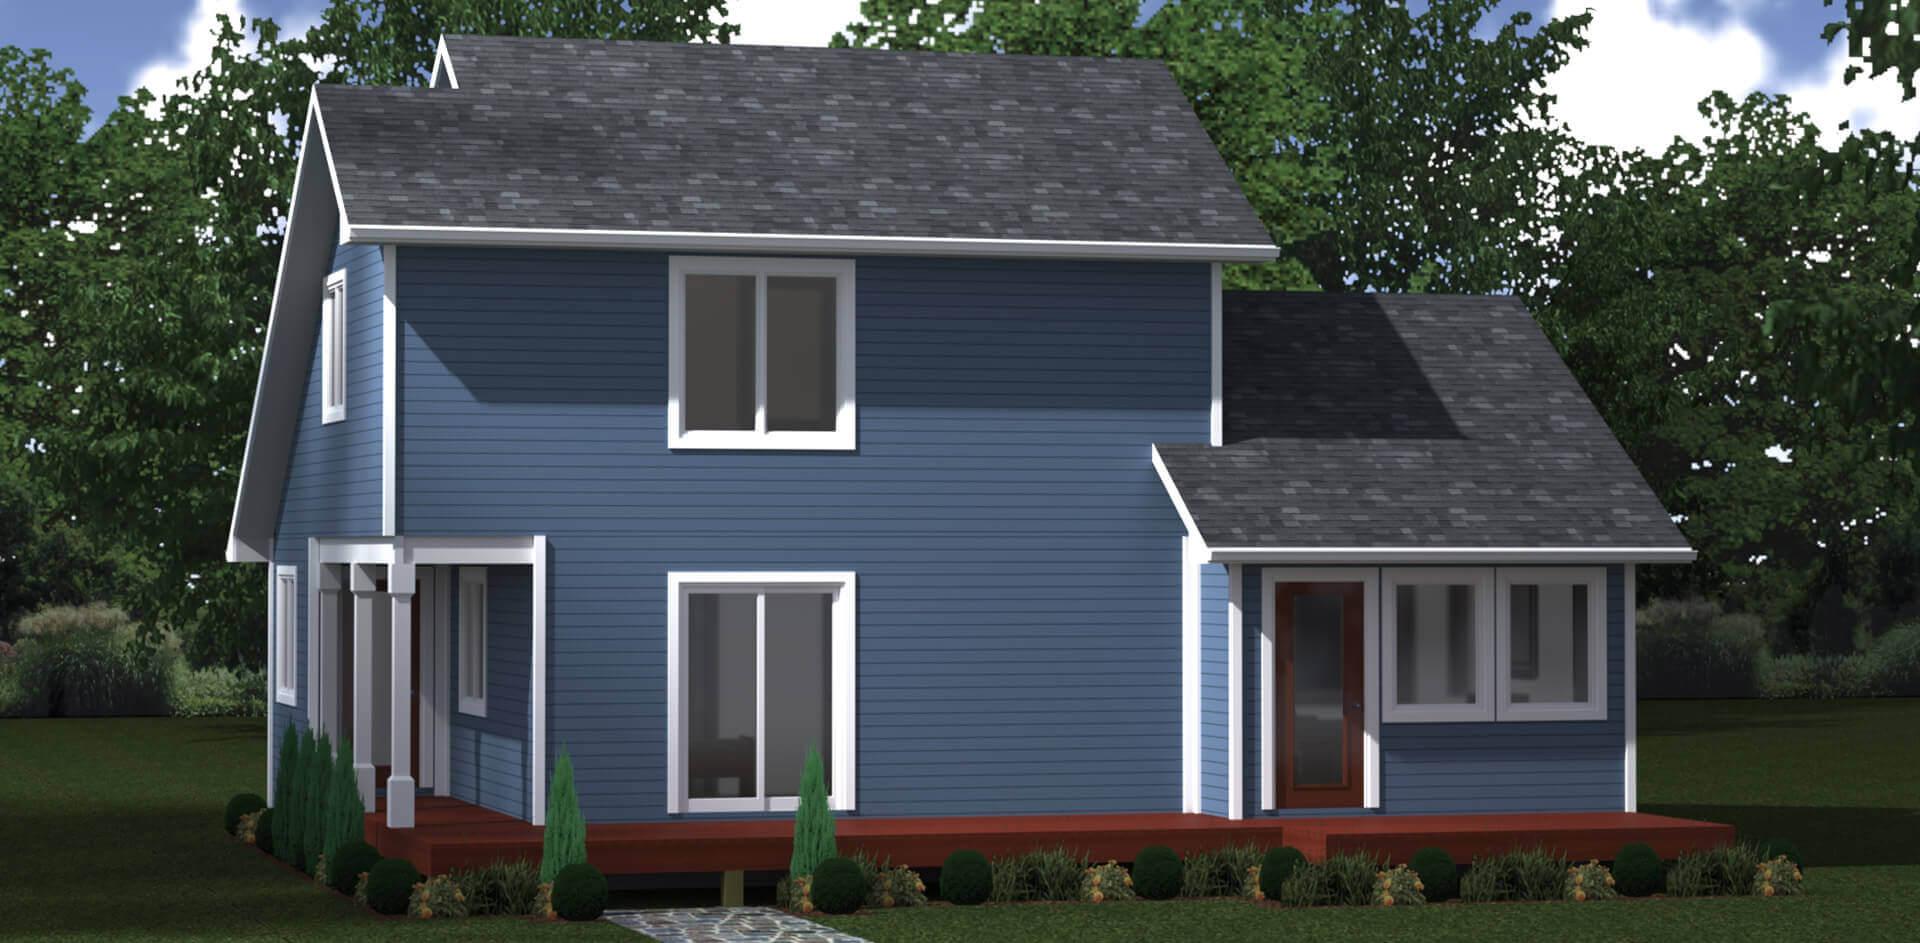 1342 house elevation